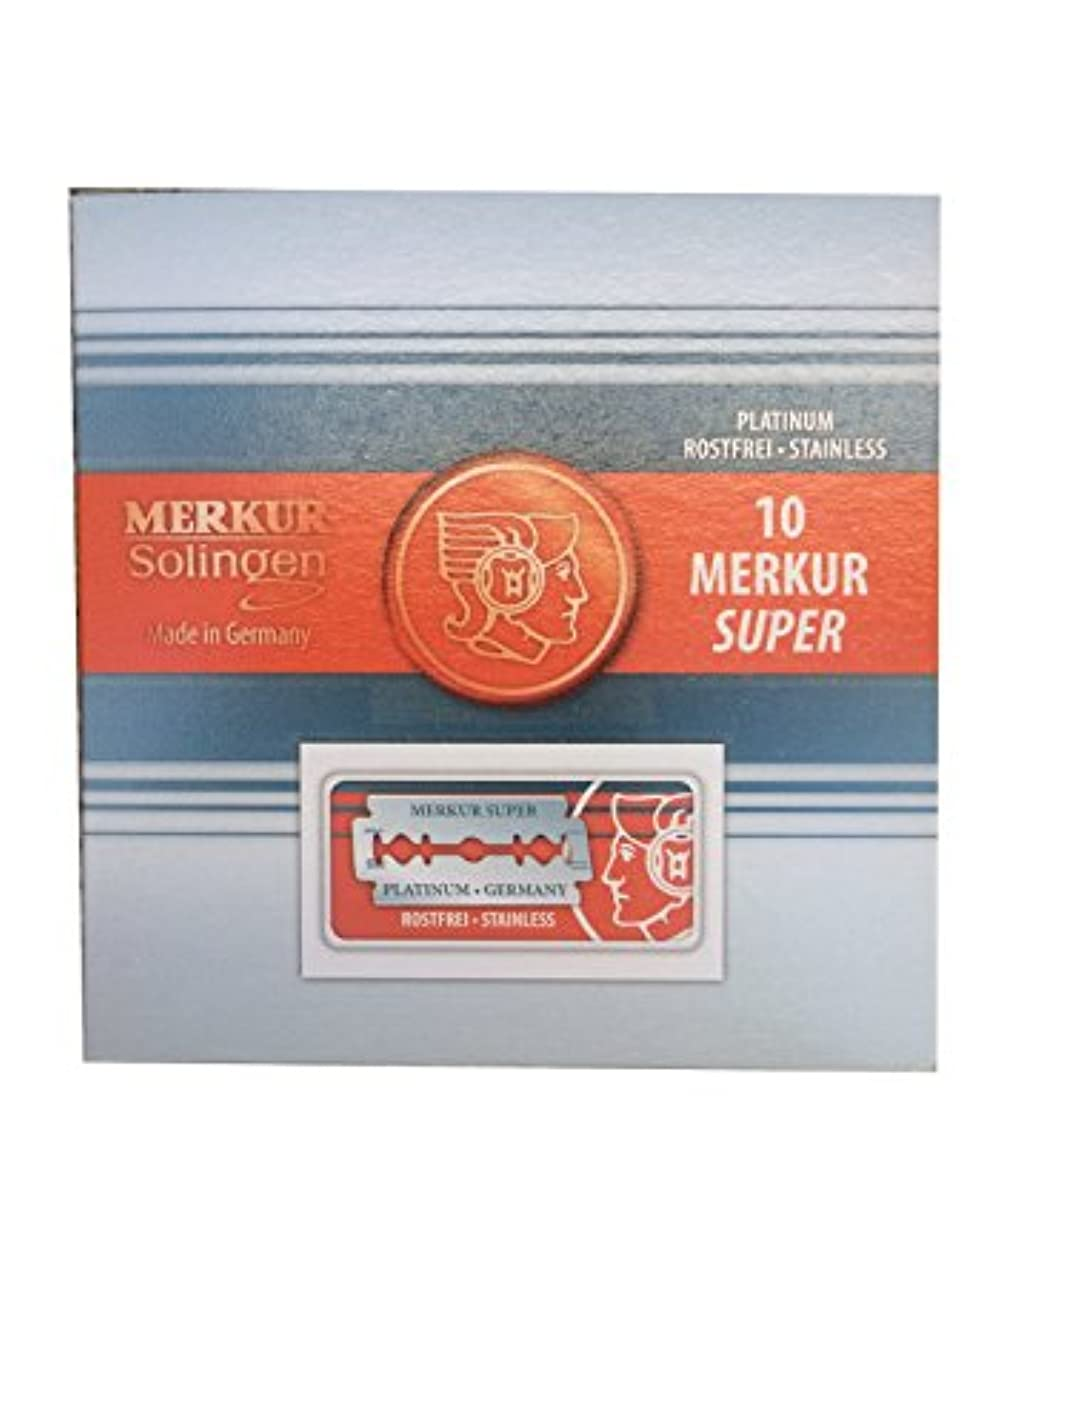 Merkur Super Platinum 両刃替刃 100枚入り(10枚入り10 個セット)【並行輸入品】